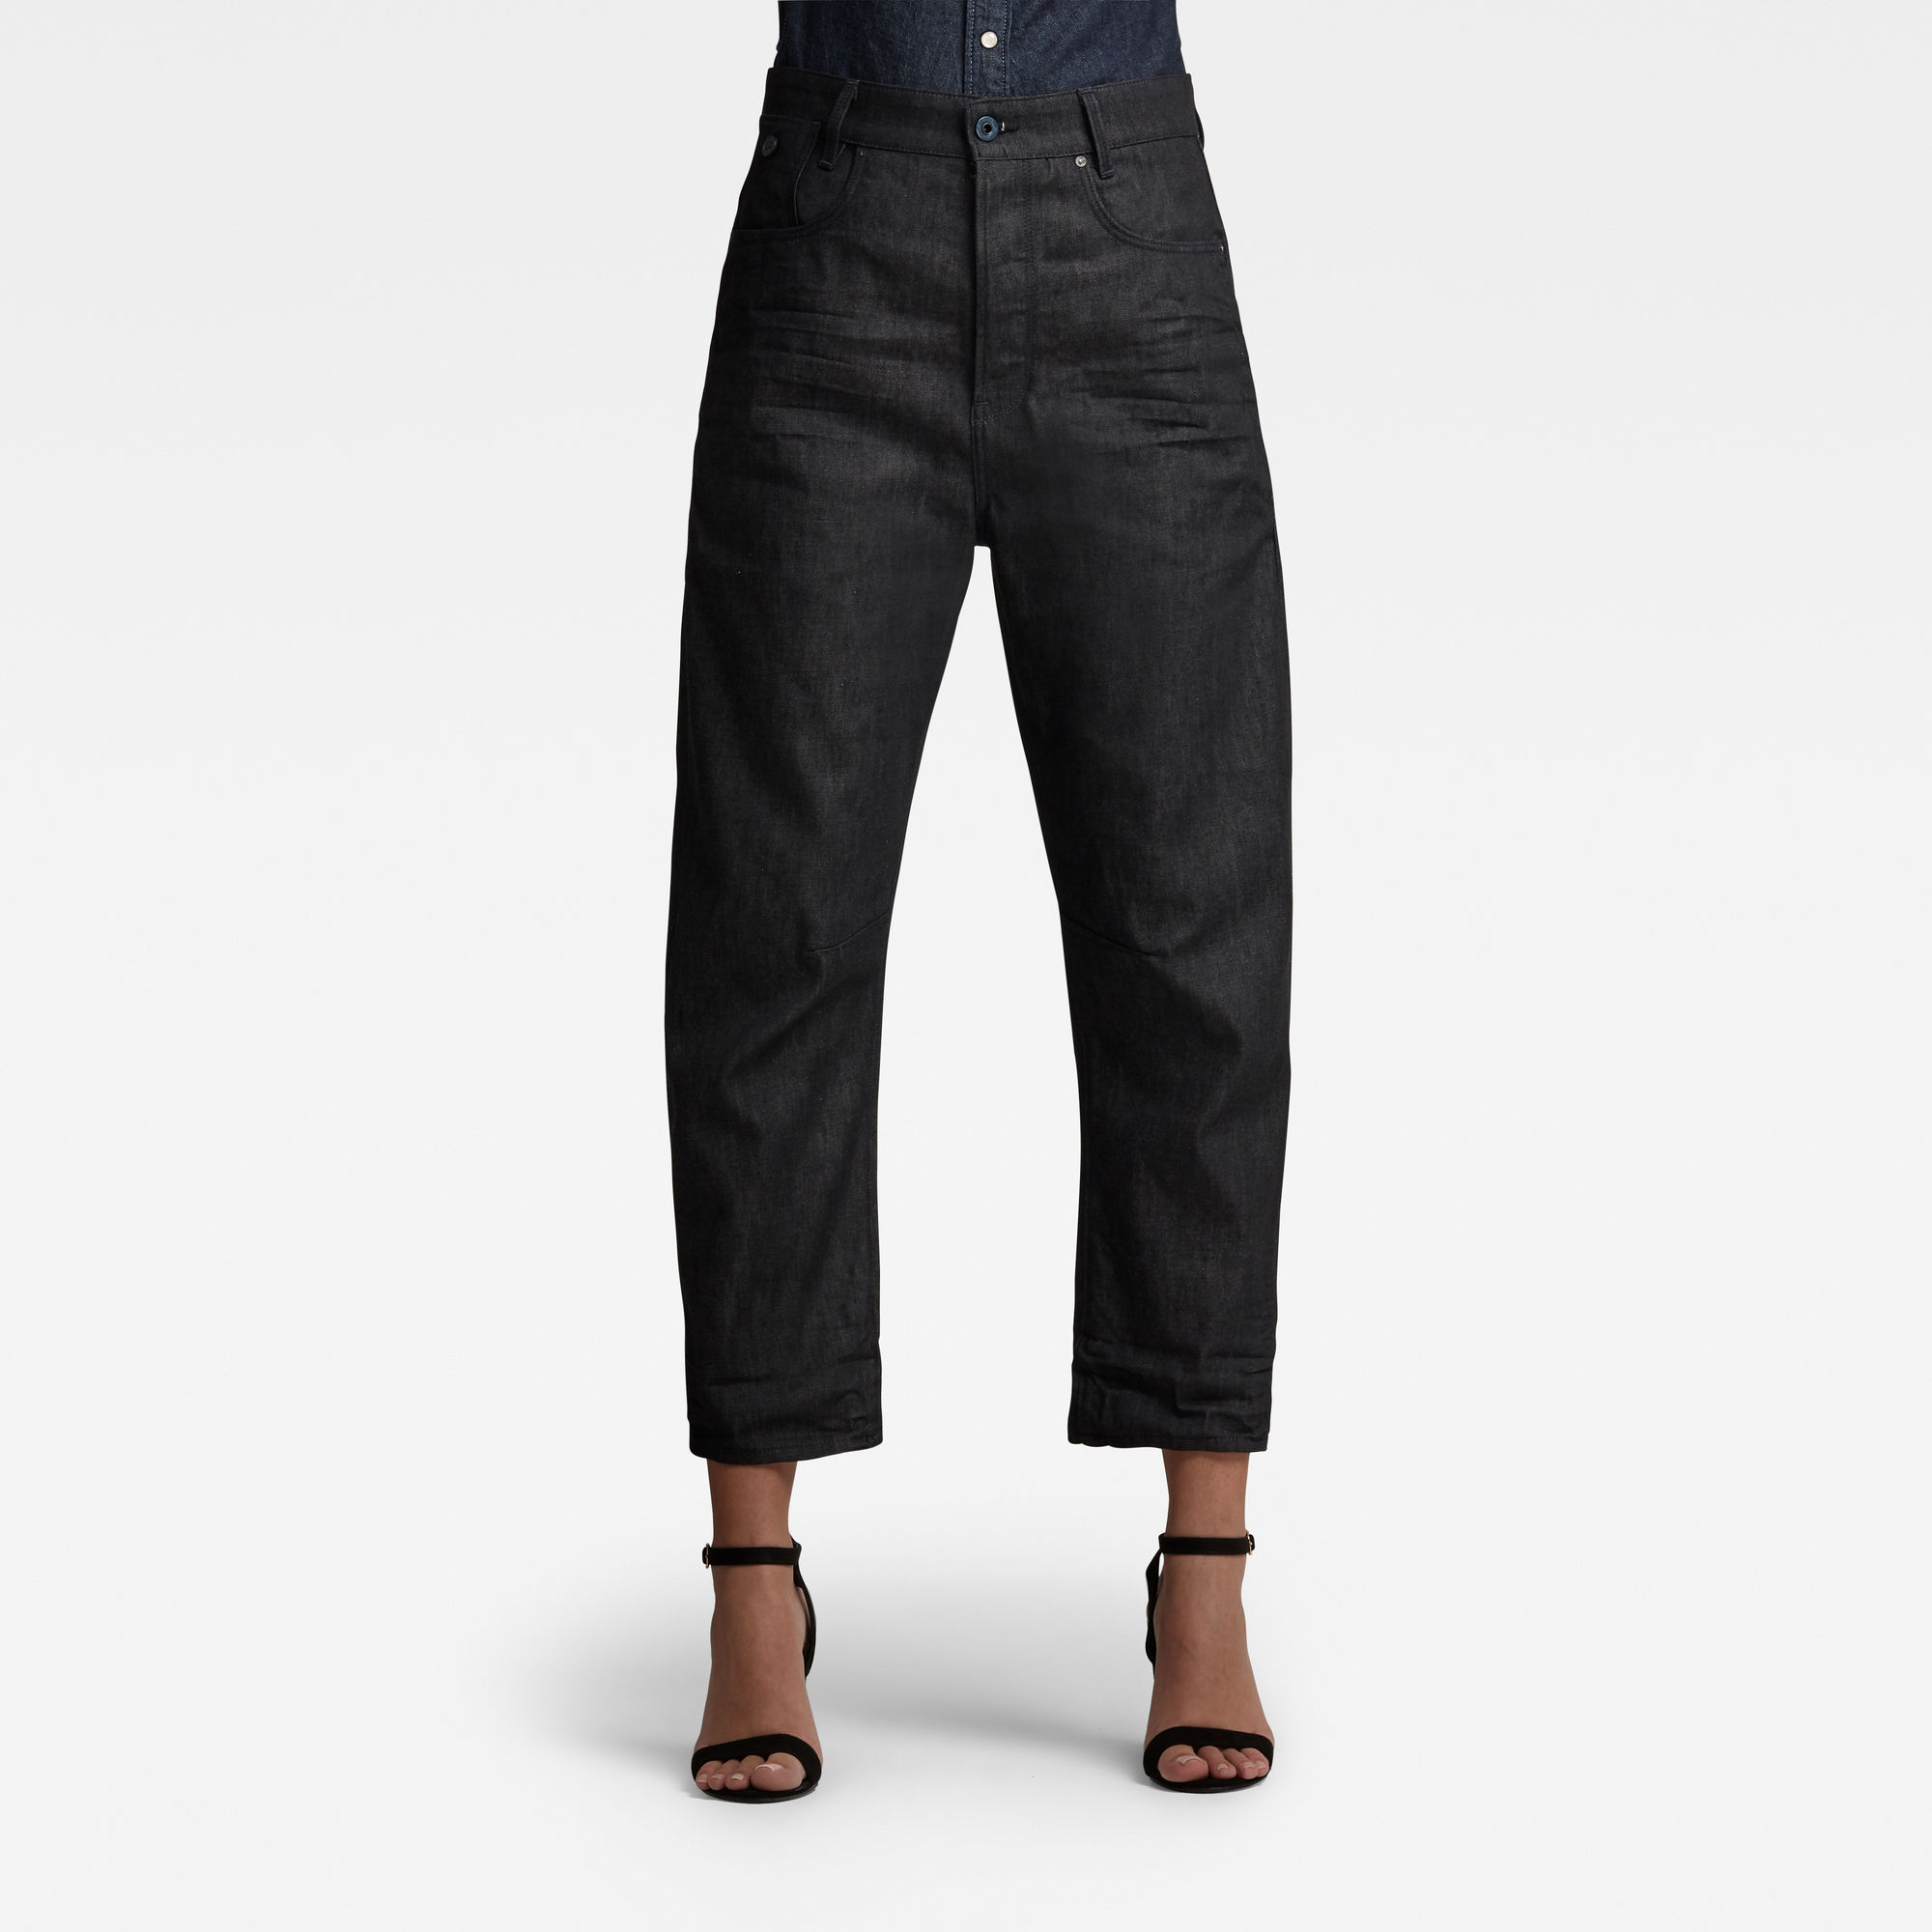 G-Star RAW Dames C-Staq 3D Boyfriend Cropped Jeans Zwart